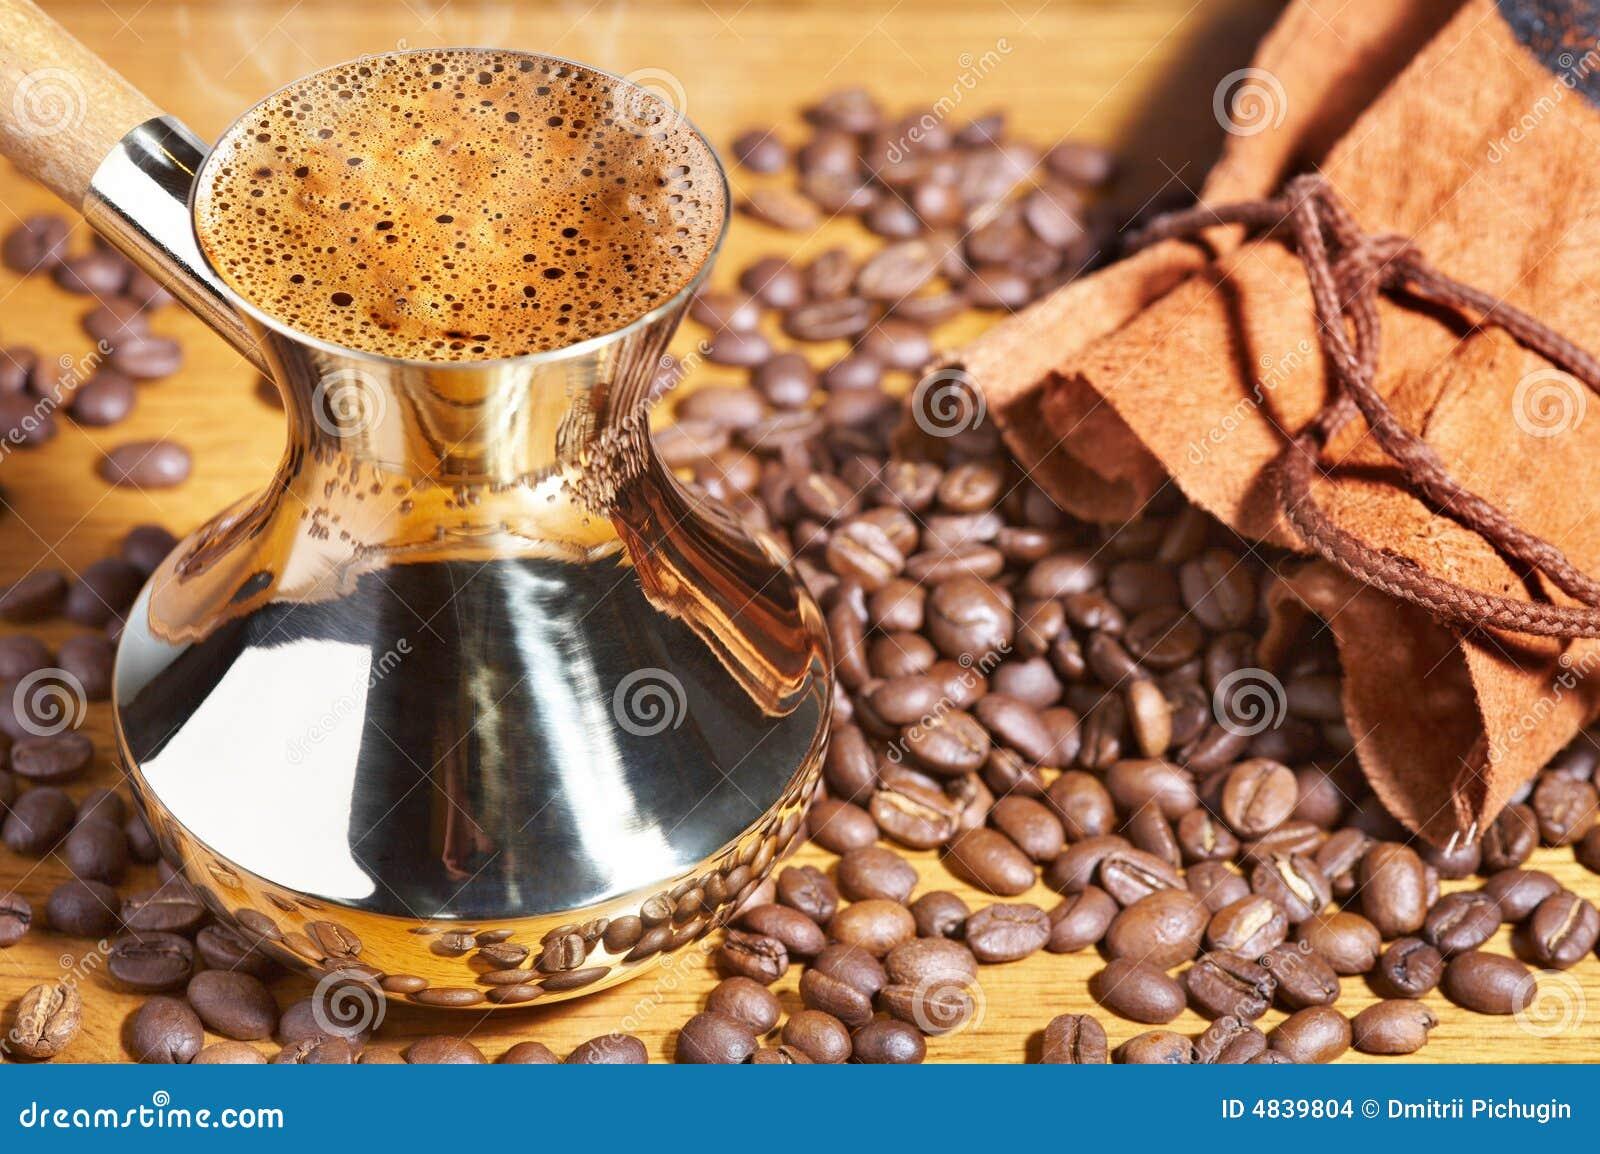 Bac de café turc